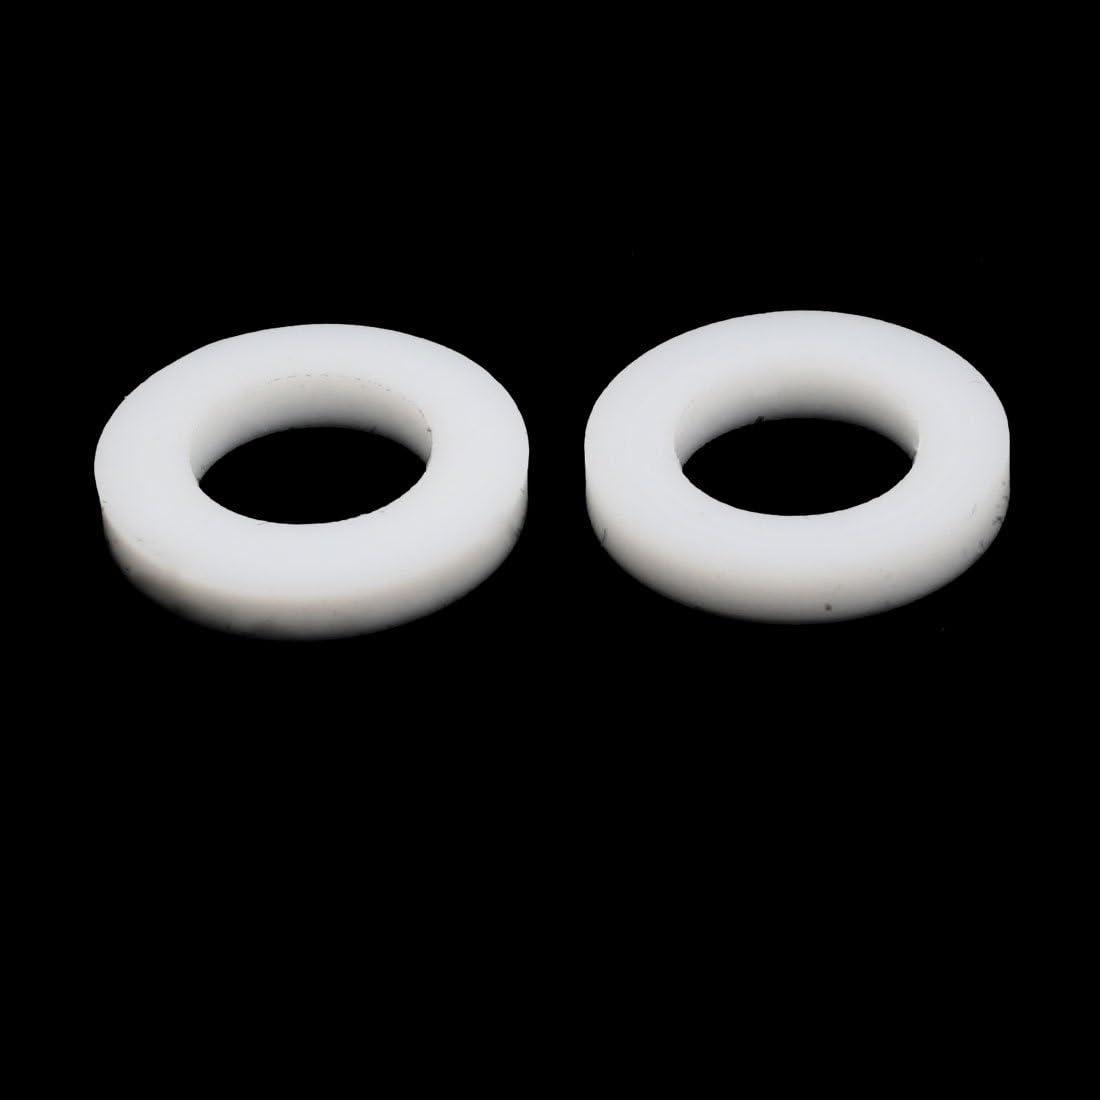 uxcell 18mmx10mmx3mm PTFE Flat Washer Flange Gasket White 10pcs